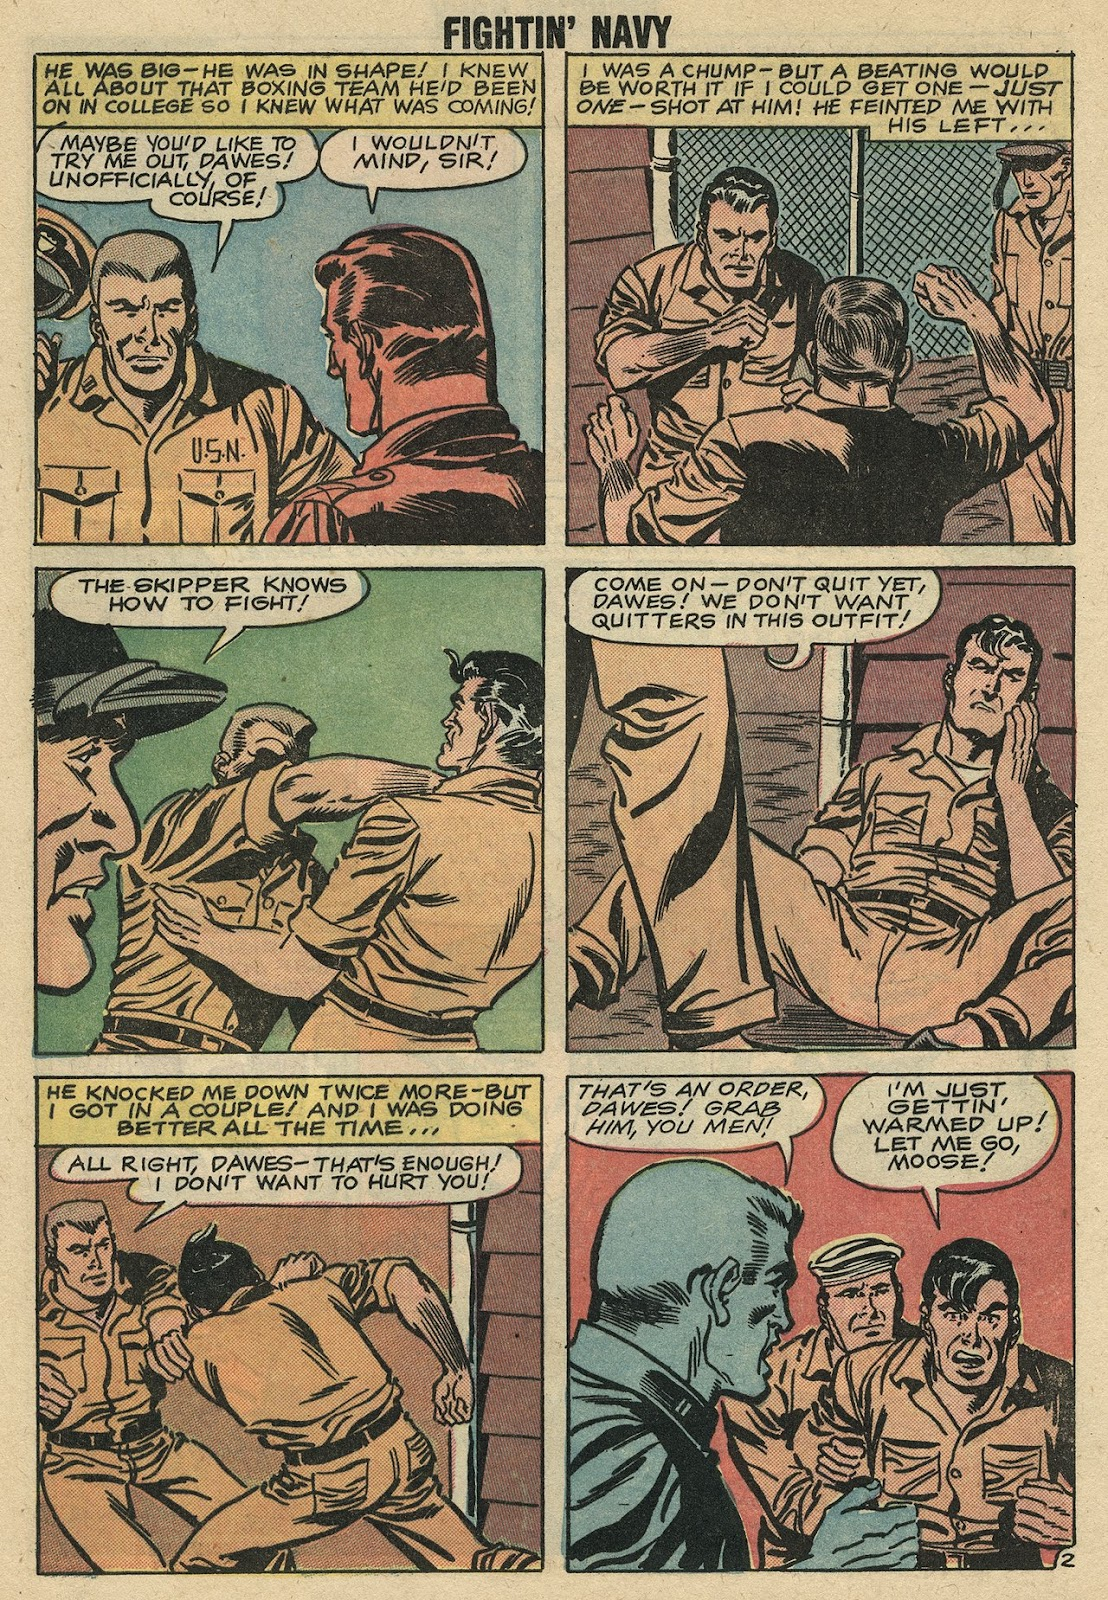 Read online Fightin' Navy comic -  Issue #86 - 28